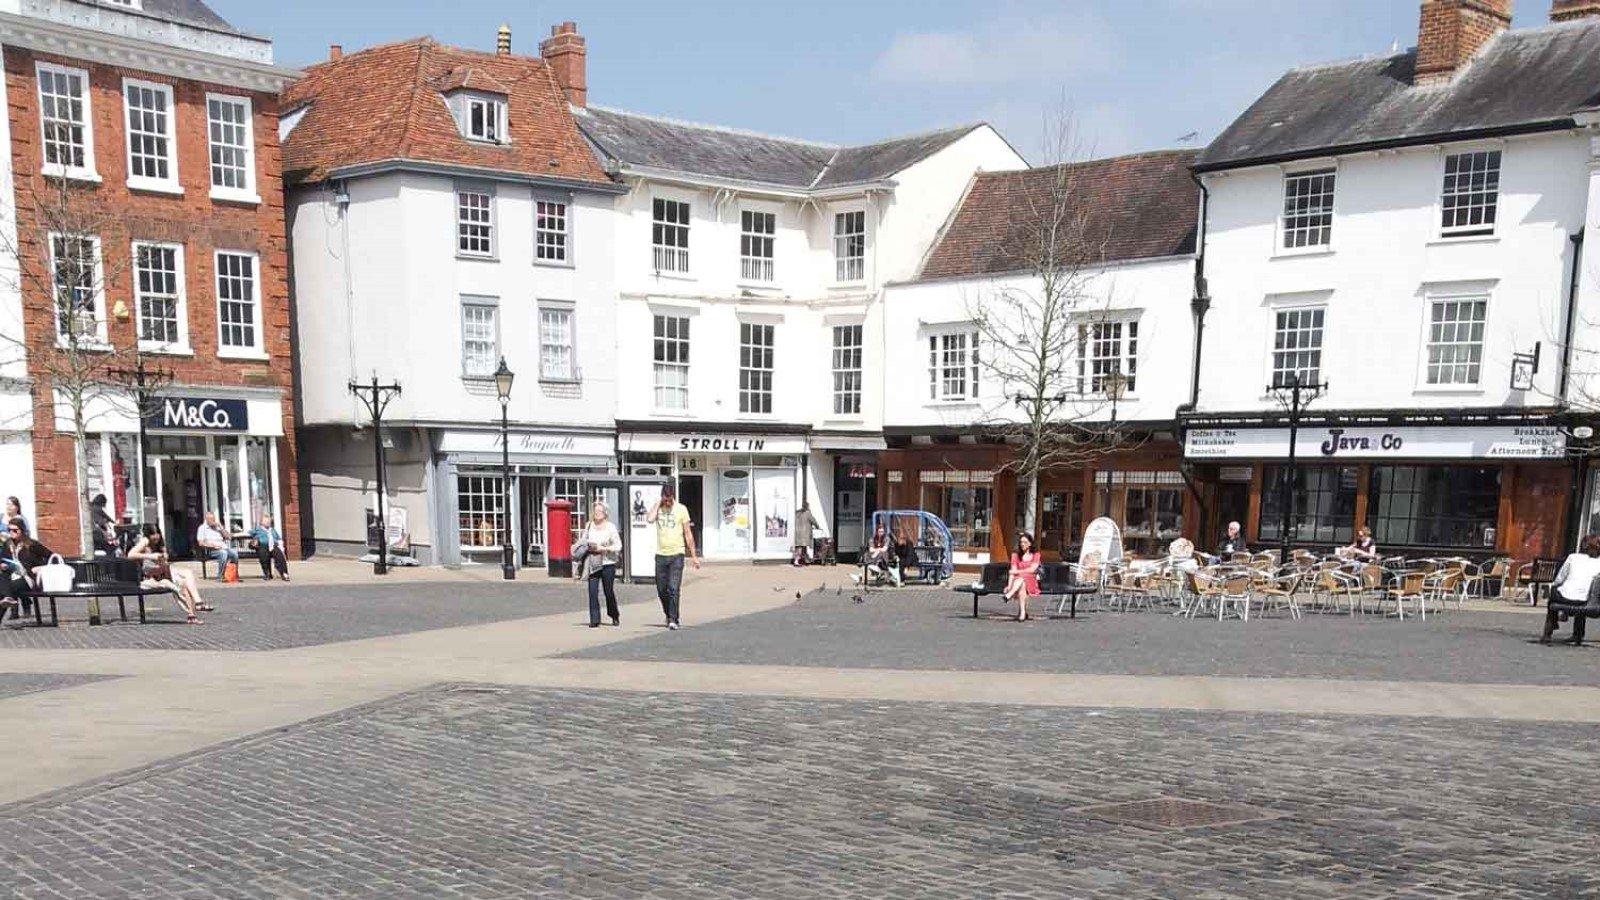 Market Place, Abingdon-on-Thames, Oxfordshire